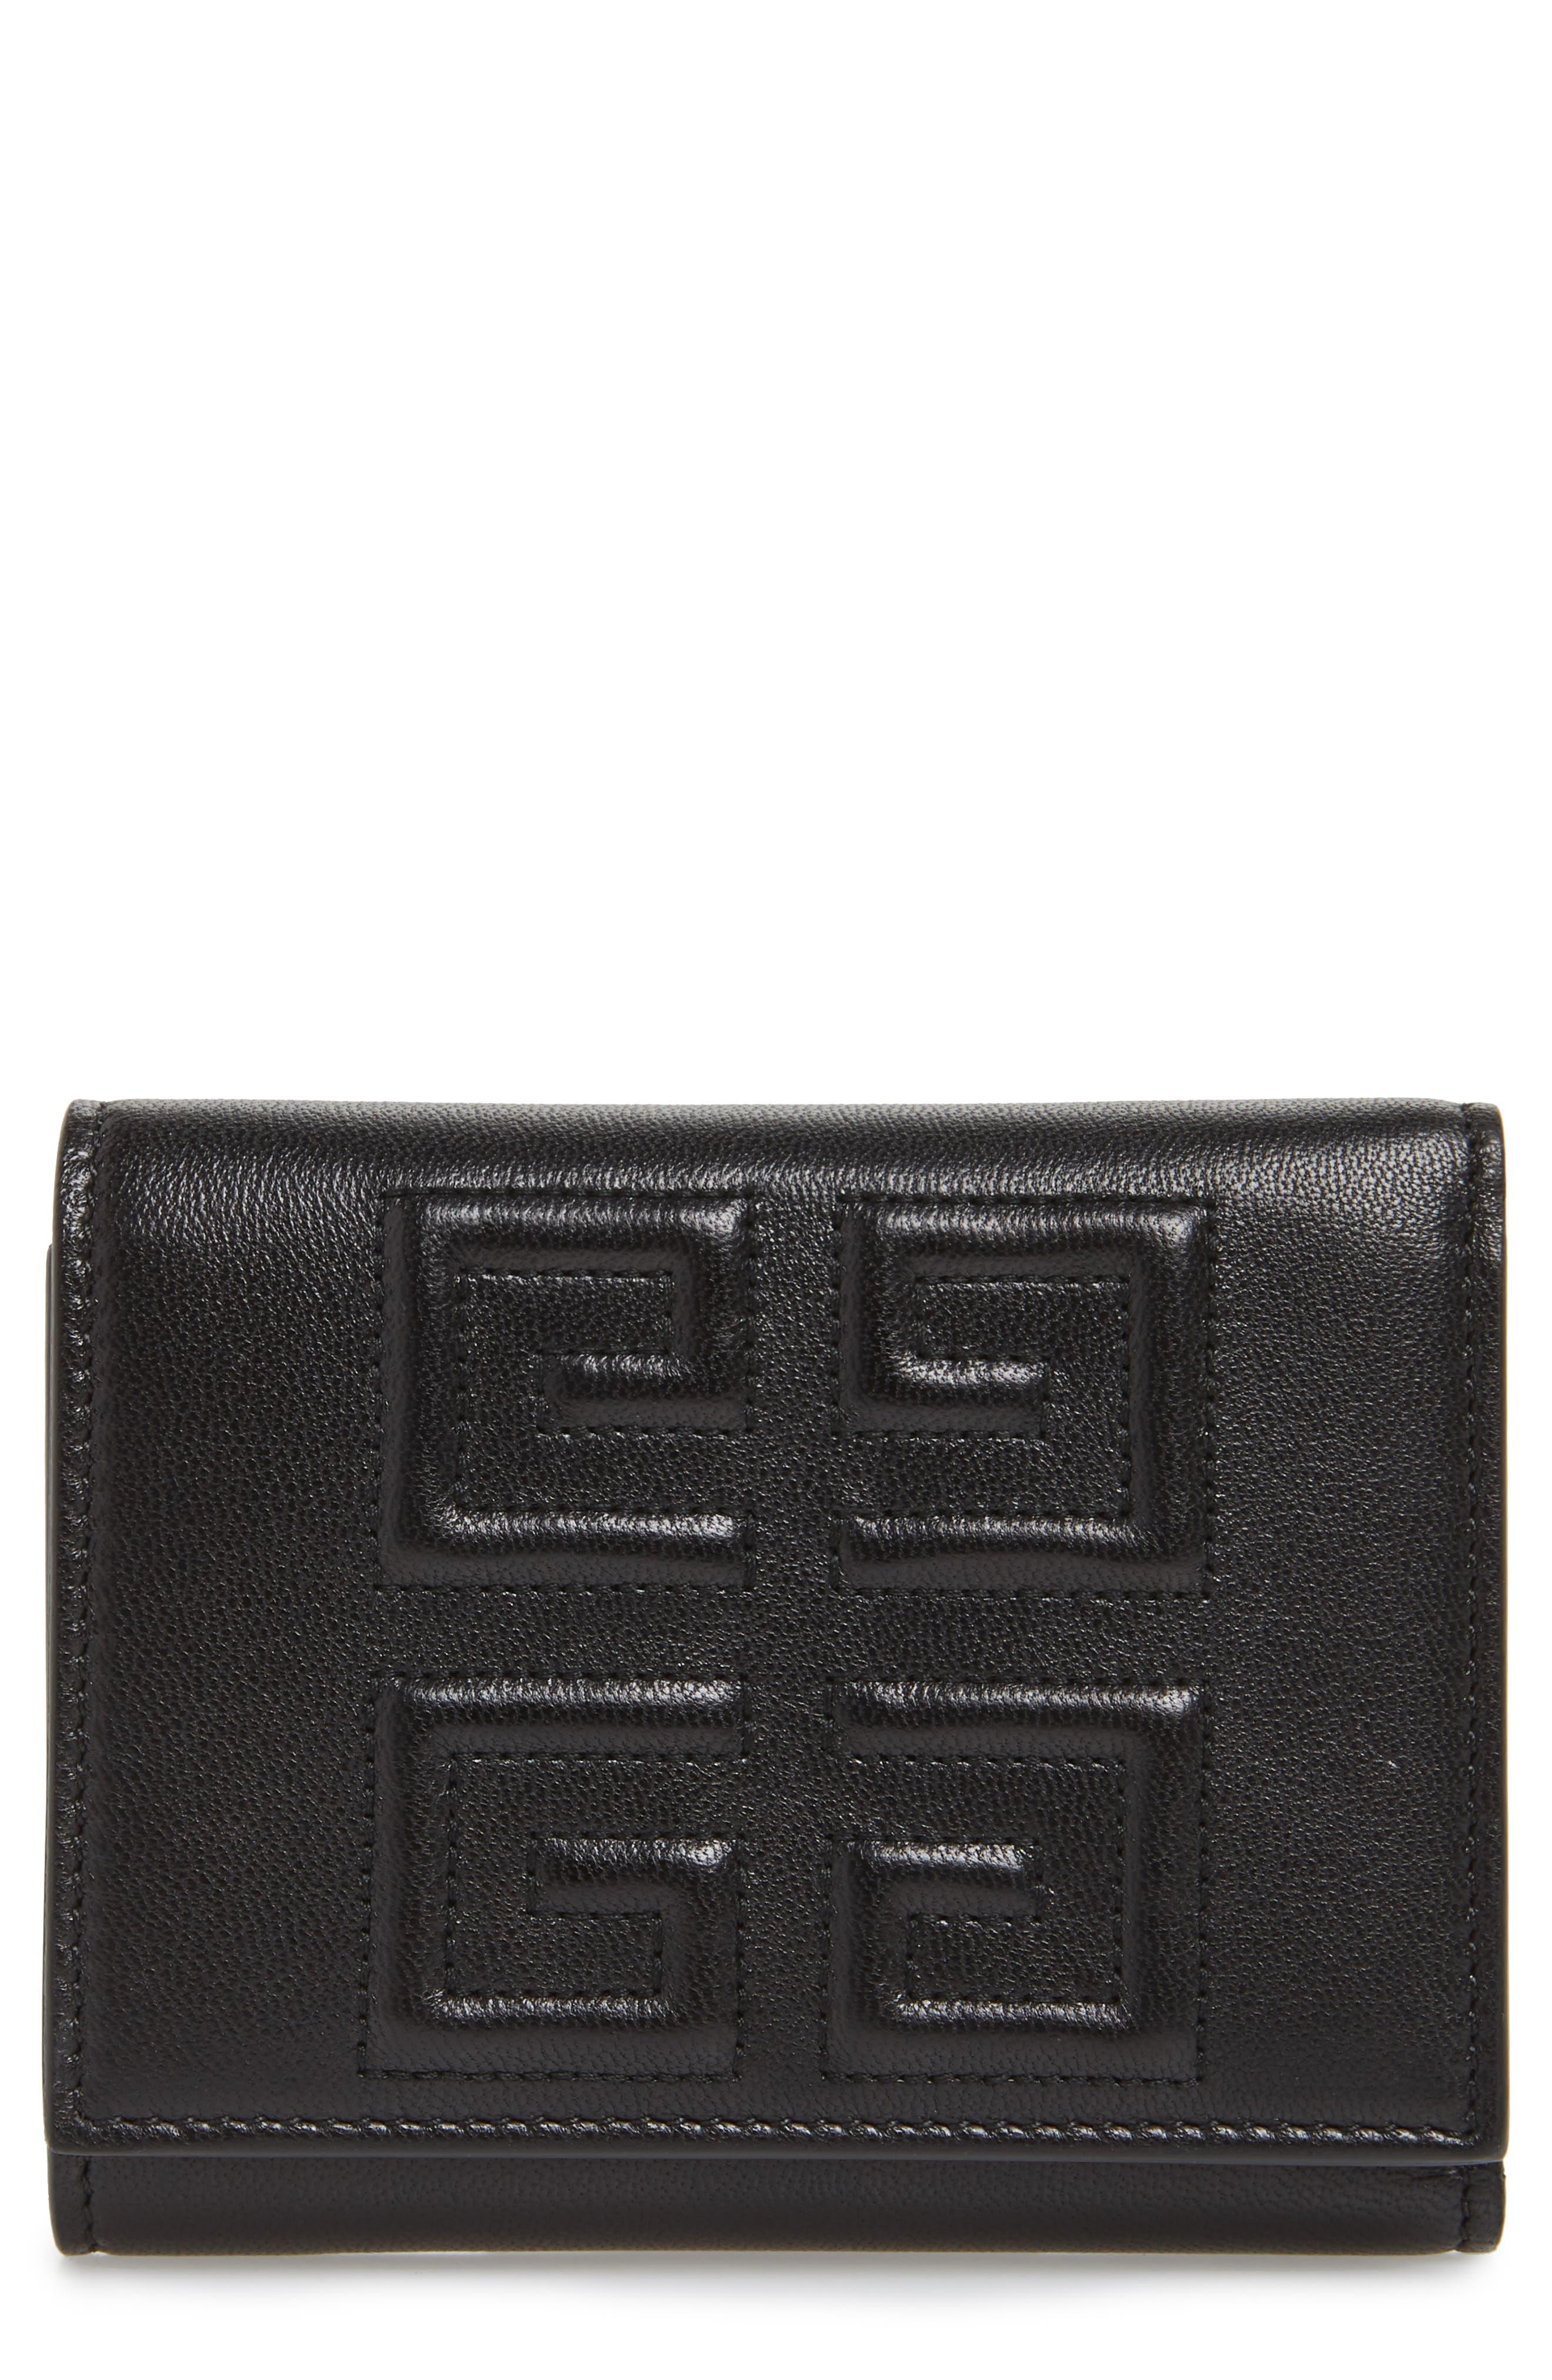 Emblem Lambskin Leather Trifold Wallet,                         Main,                         color, BLACK